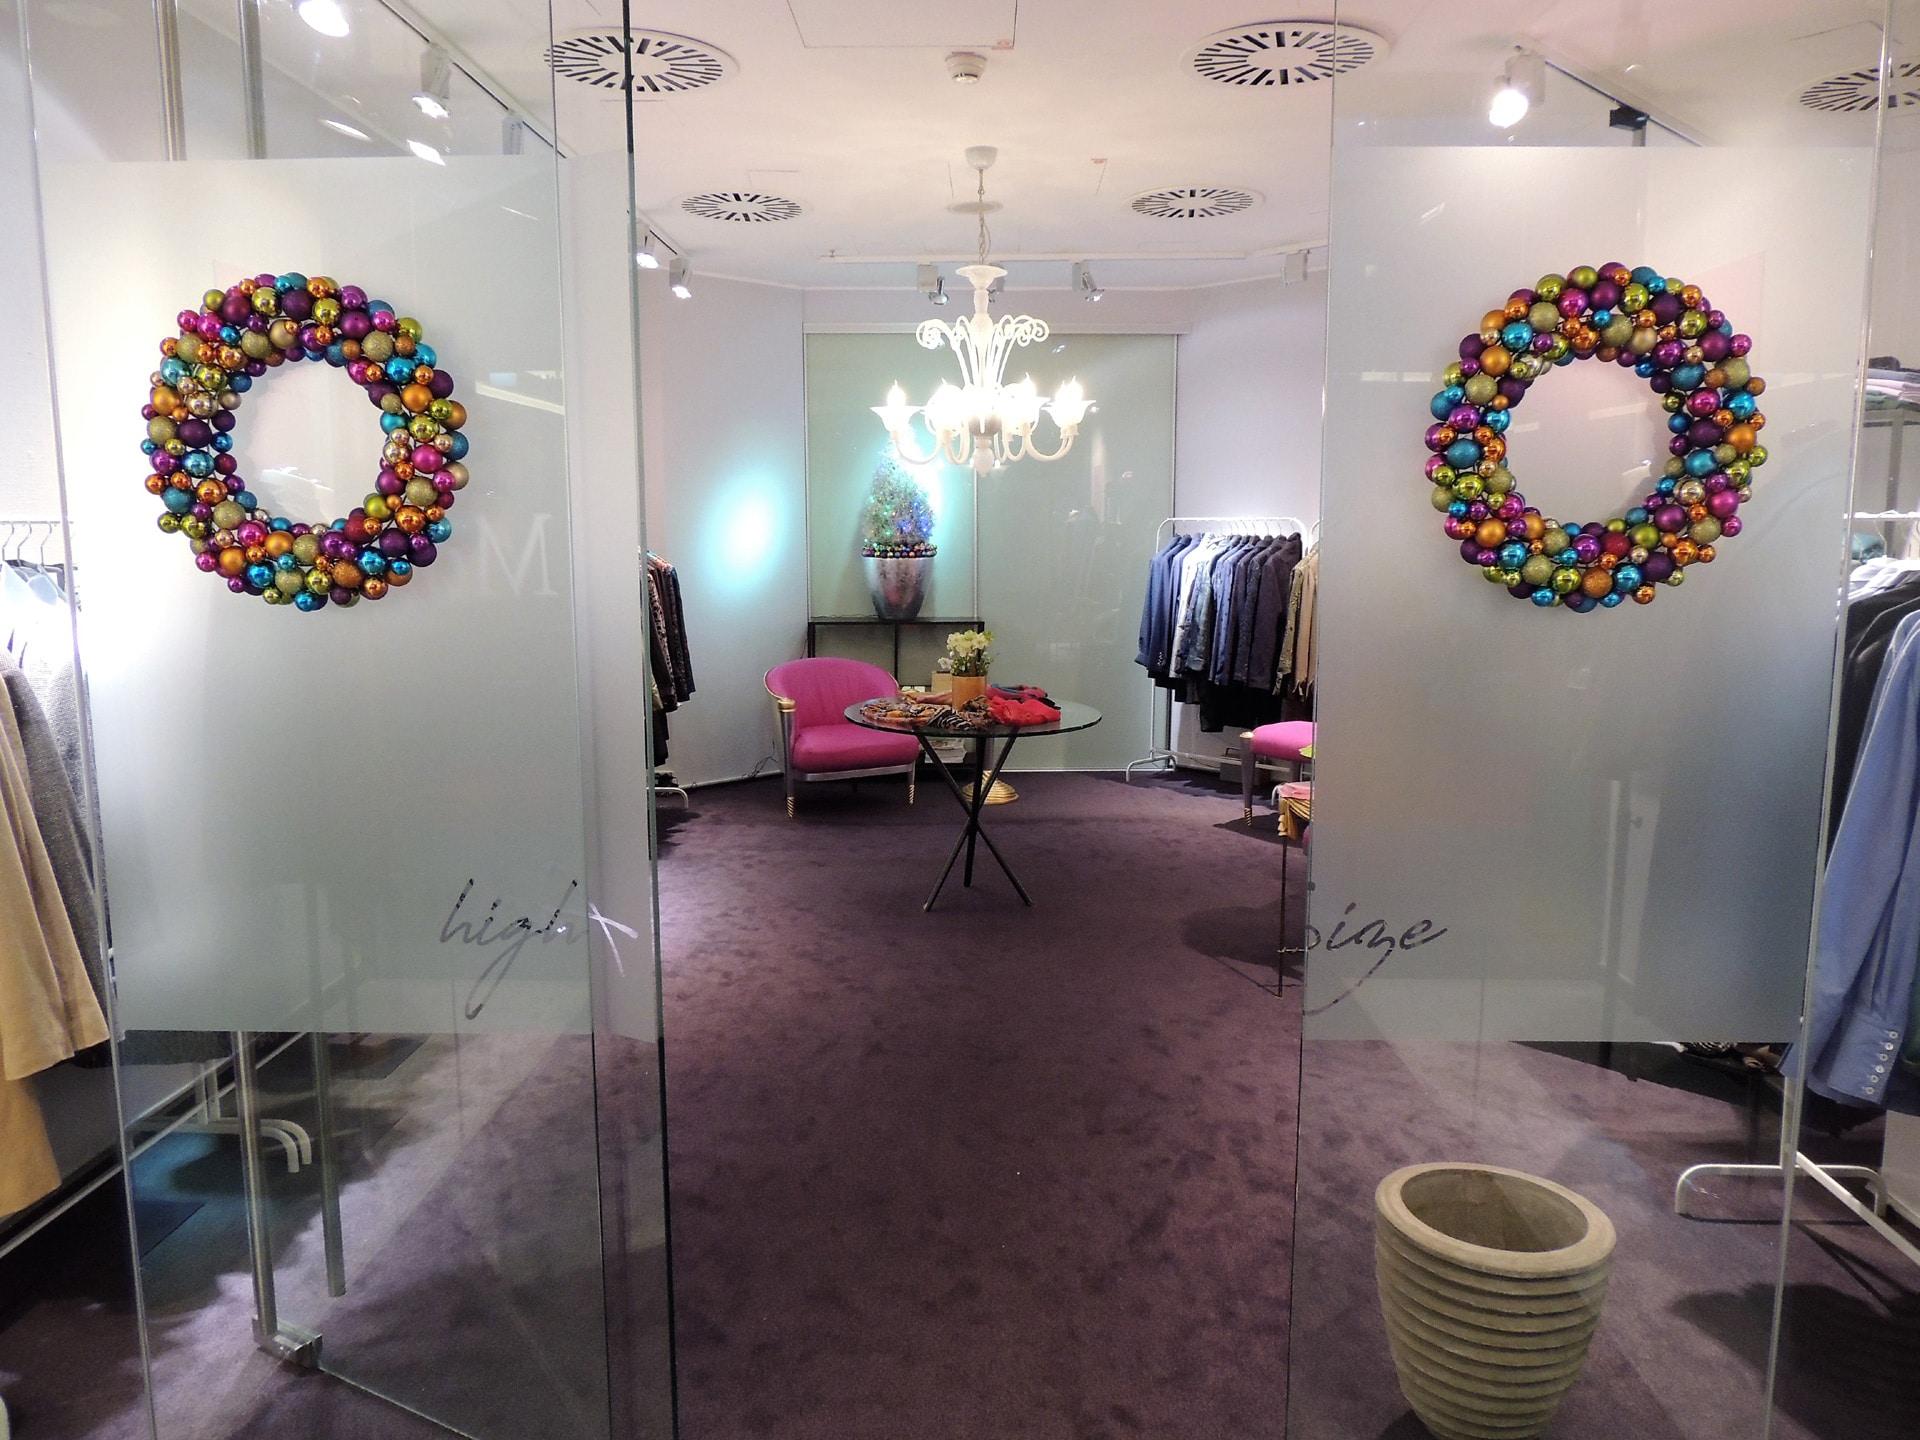 Moda-Piu-Store-Koeln